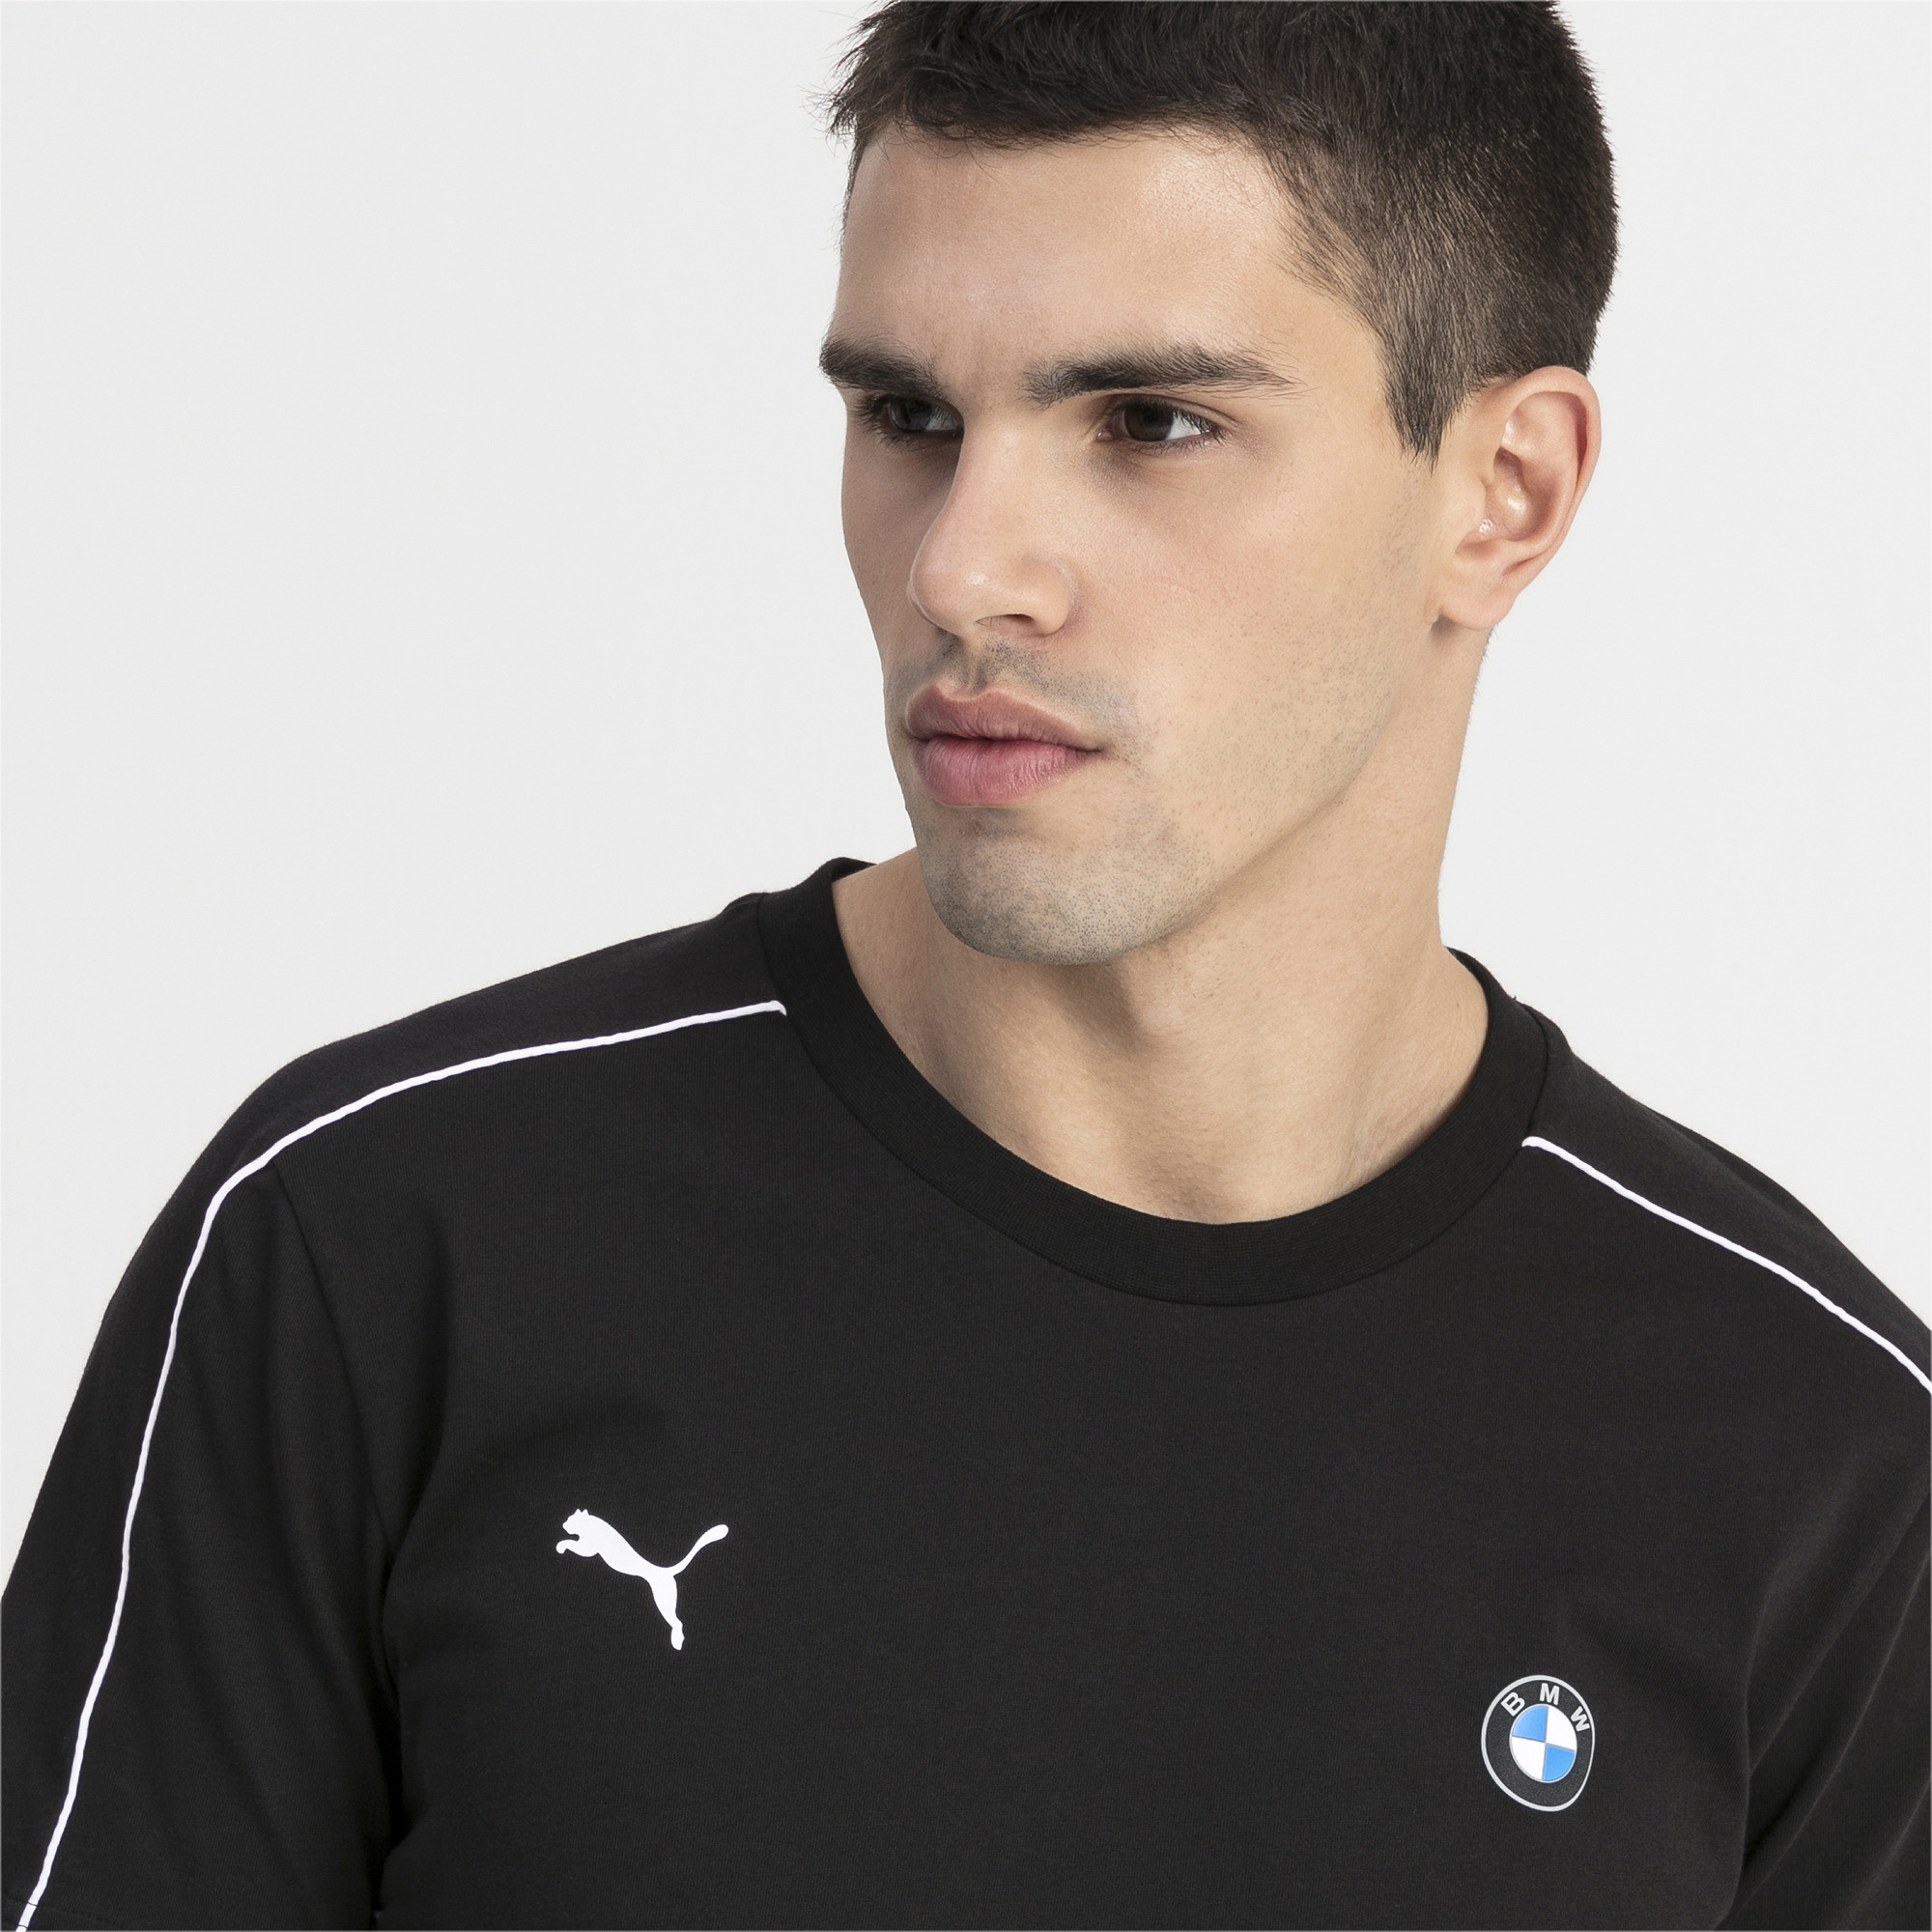 Indexbild 7 - PUMA BMW M Motorsport T7 Herren T-Shirt Männer T-Shirt Neu